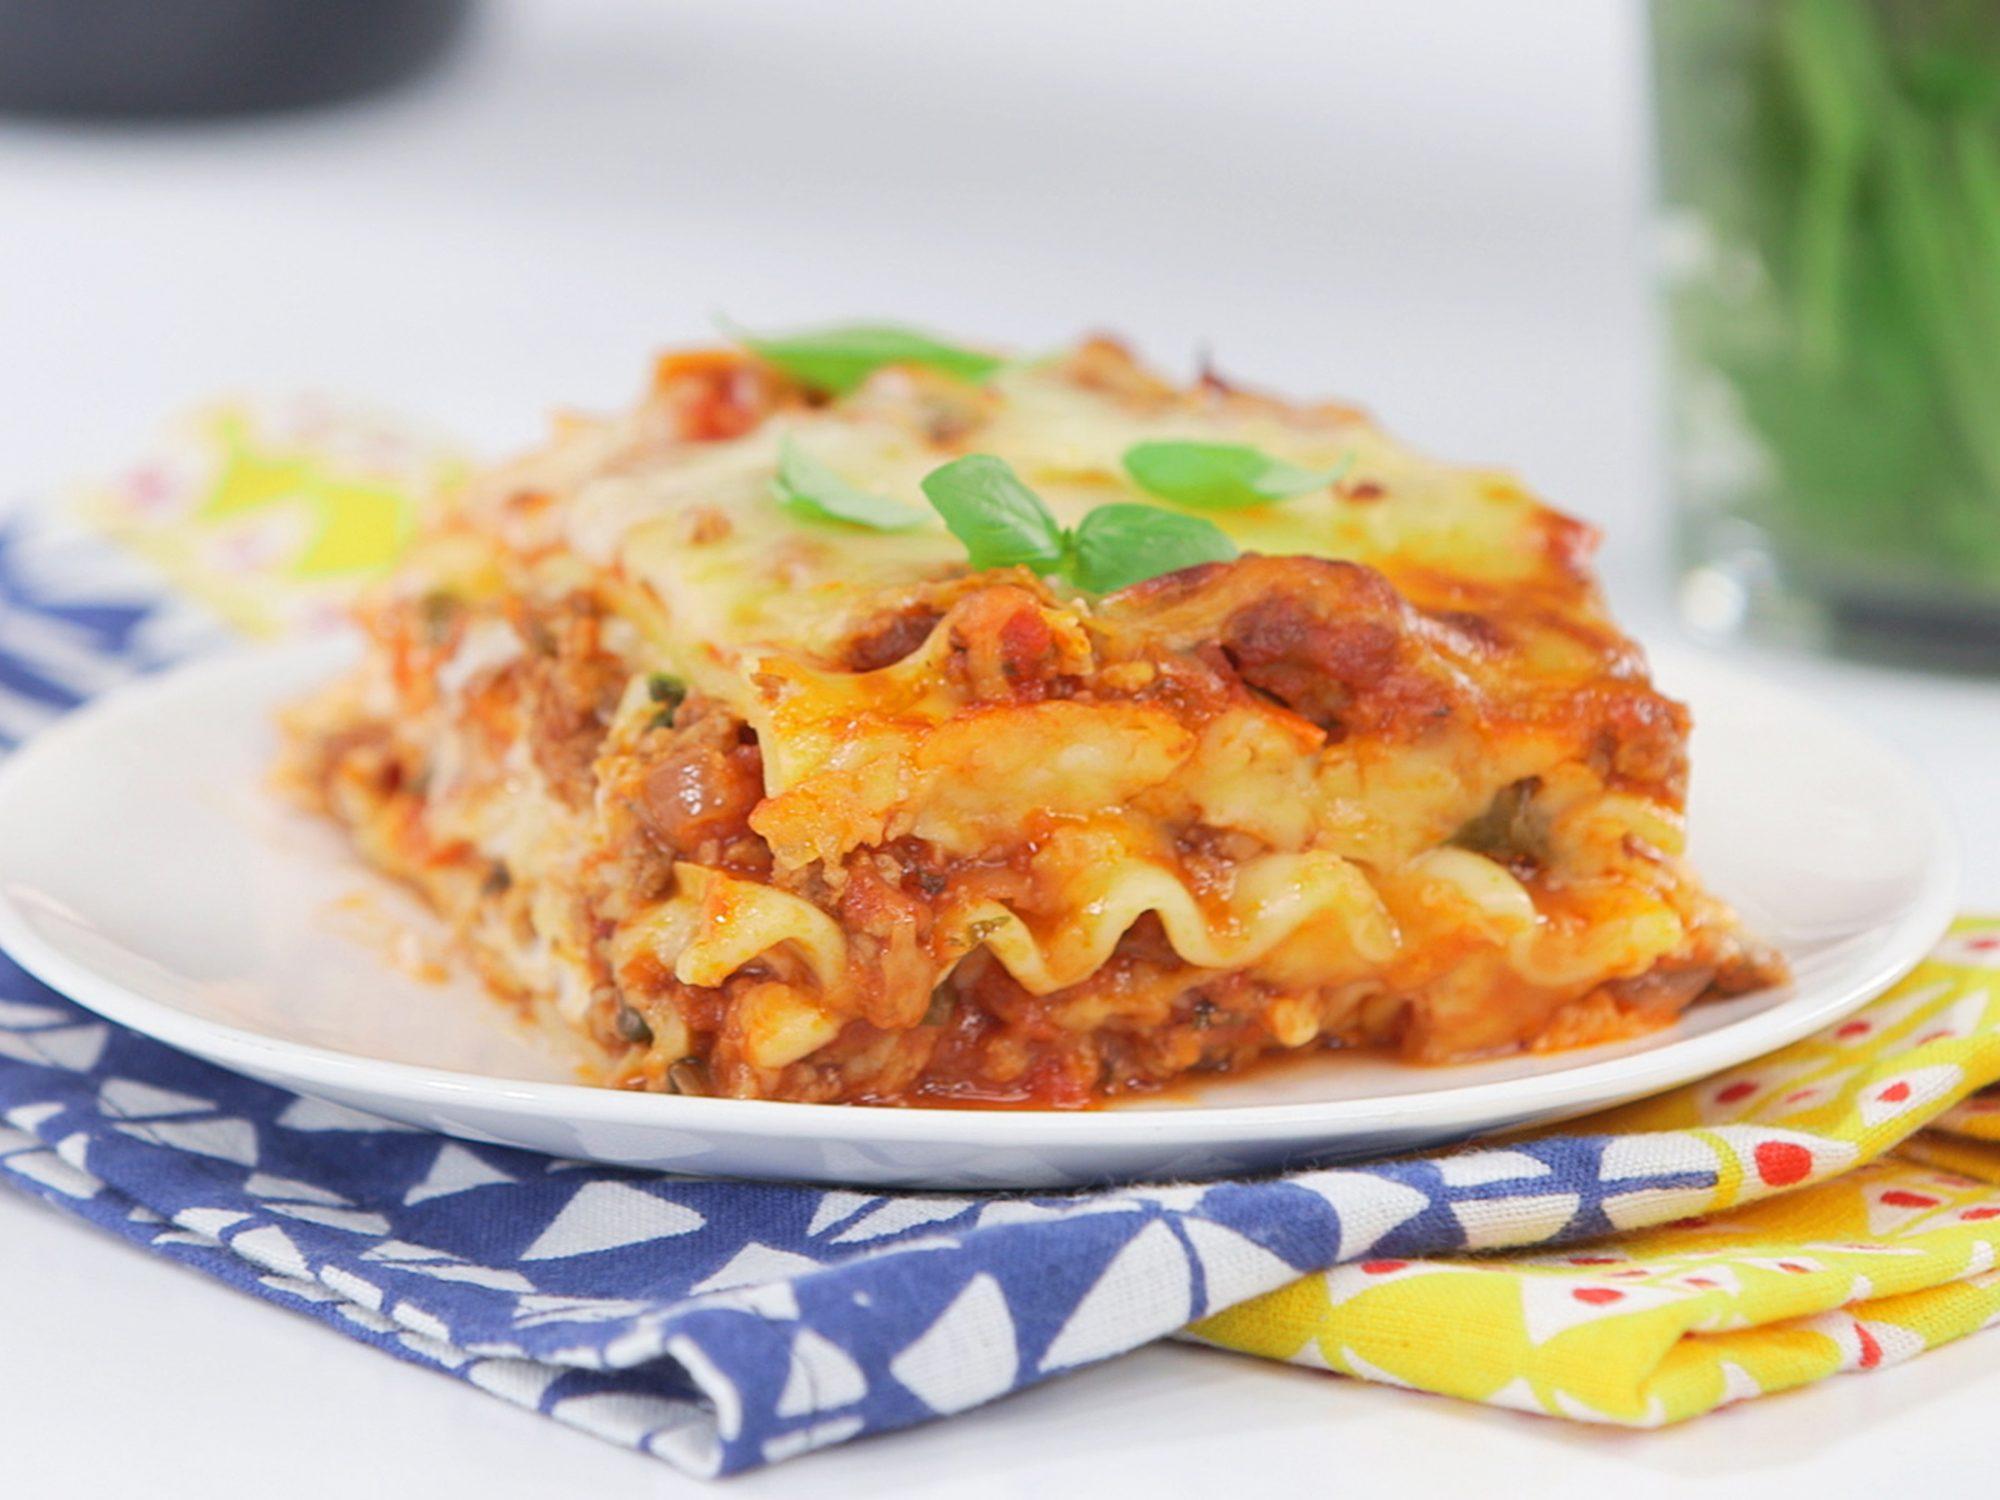 Nicole's Best Lasagna image